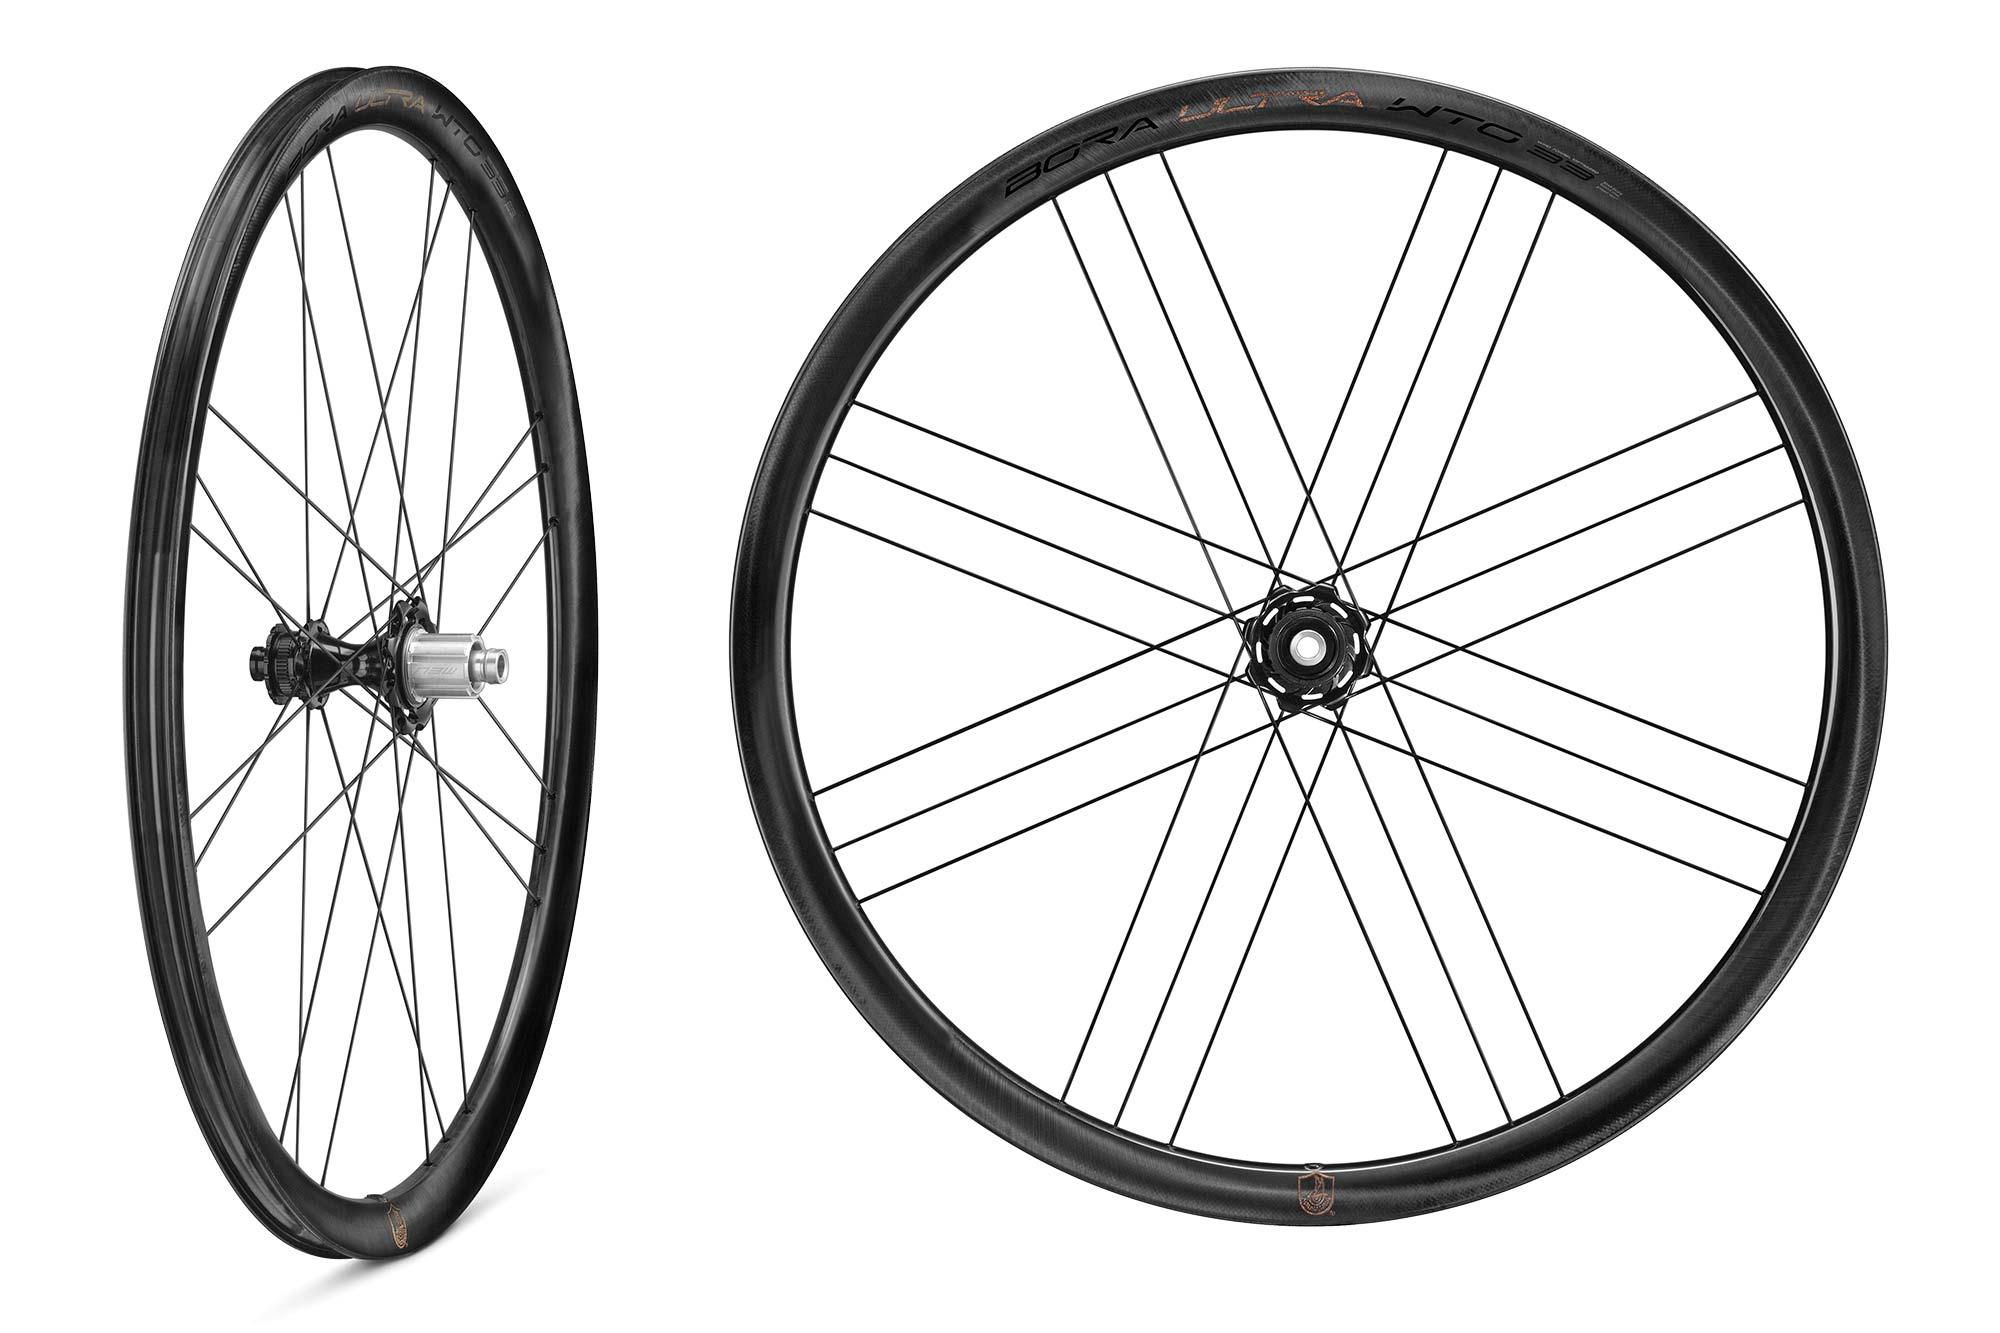 2021 Campagnolo Bora Ultra WTO 30 aero carbon road bike wheelset